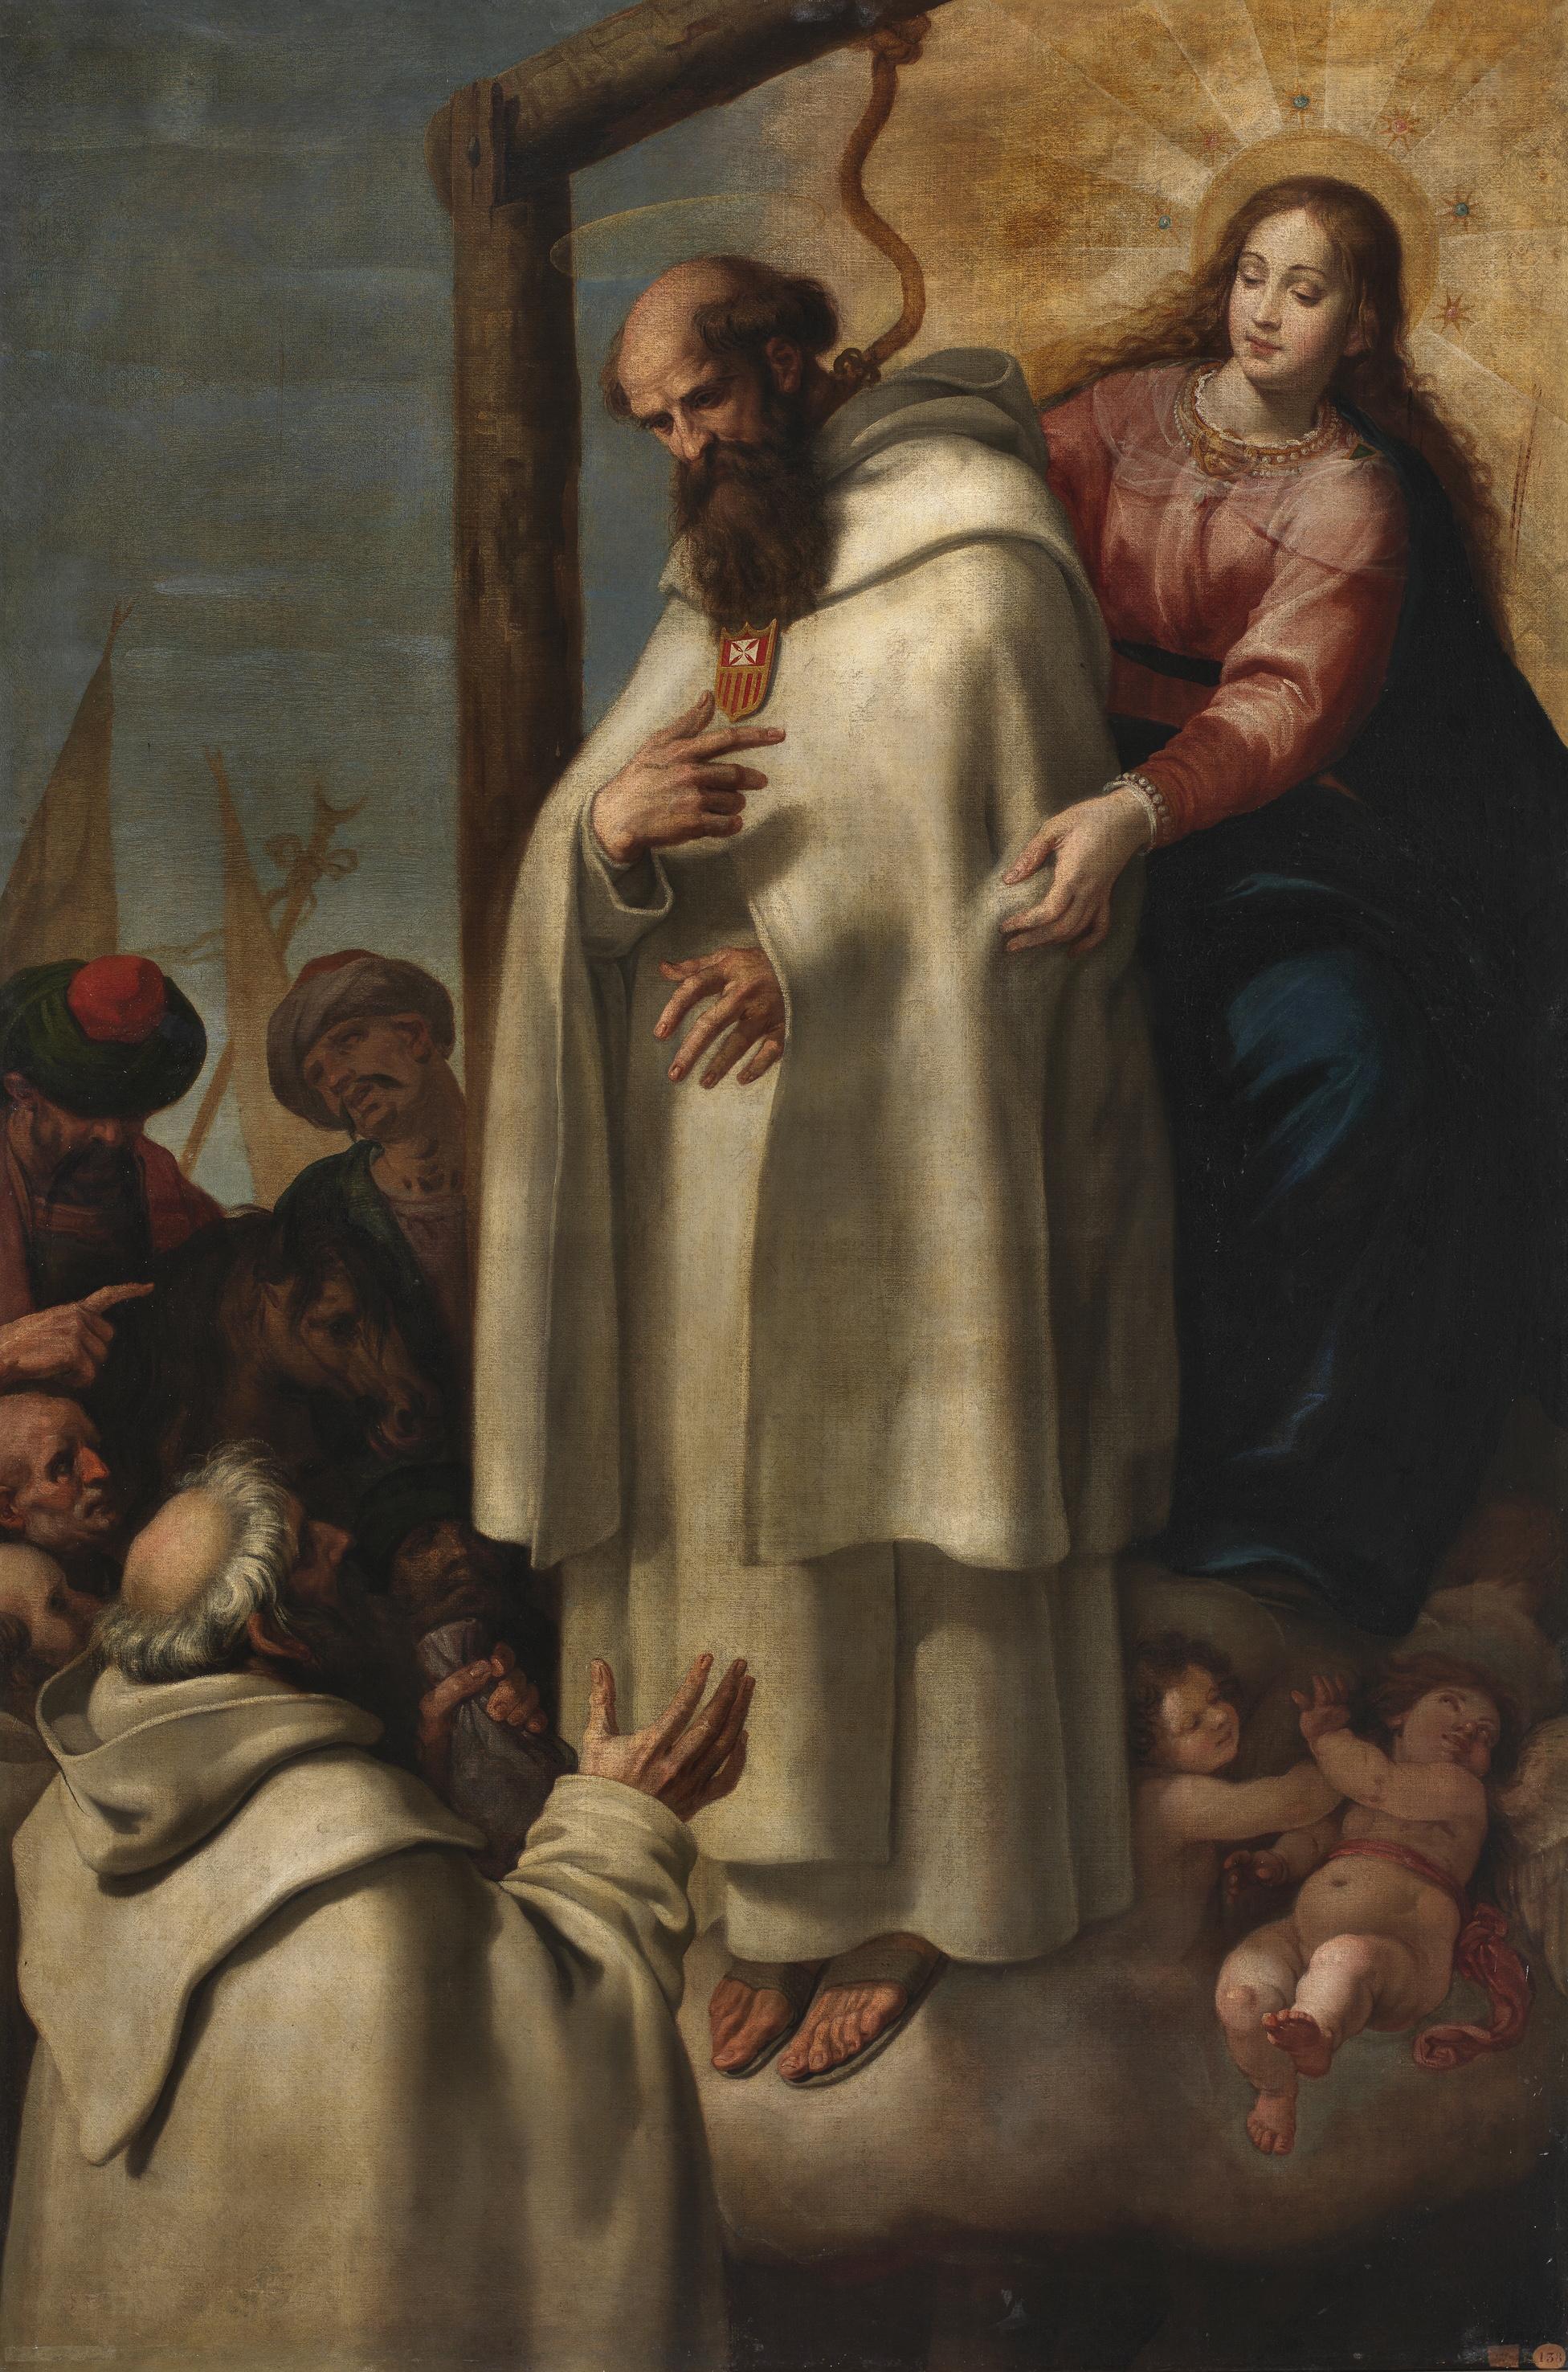 St. Peter Armengol